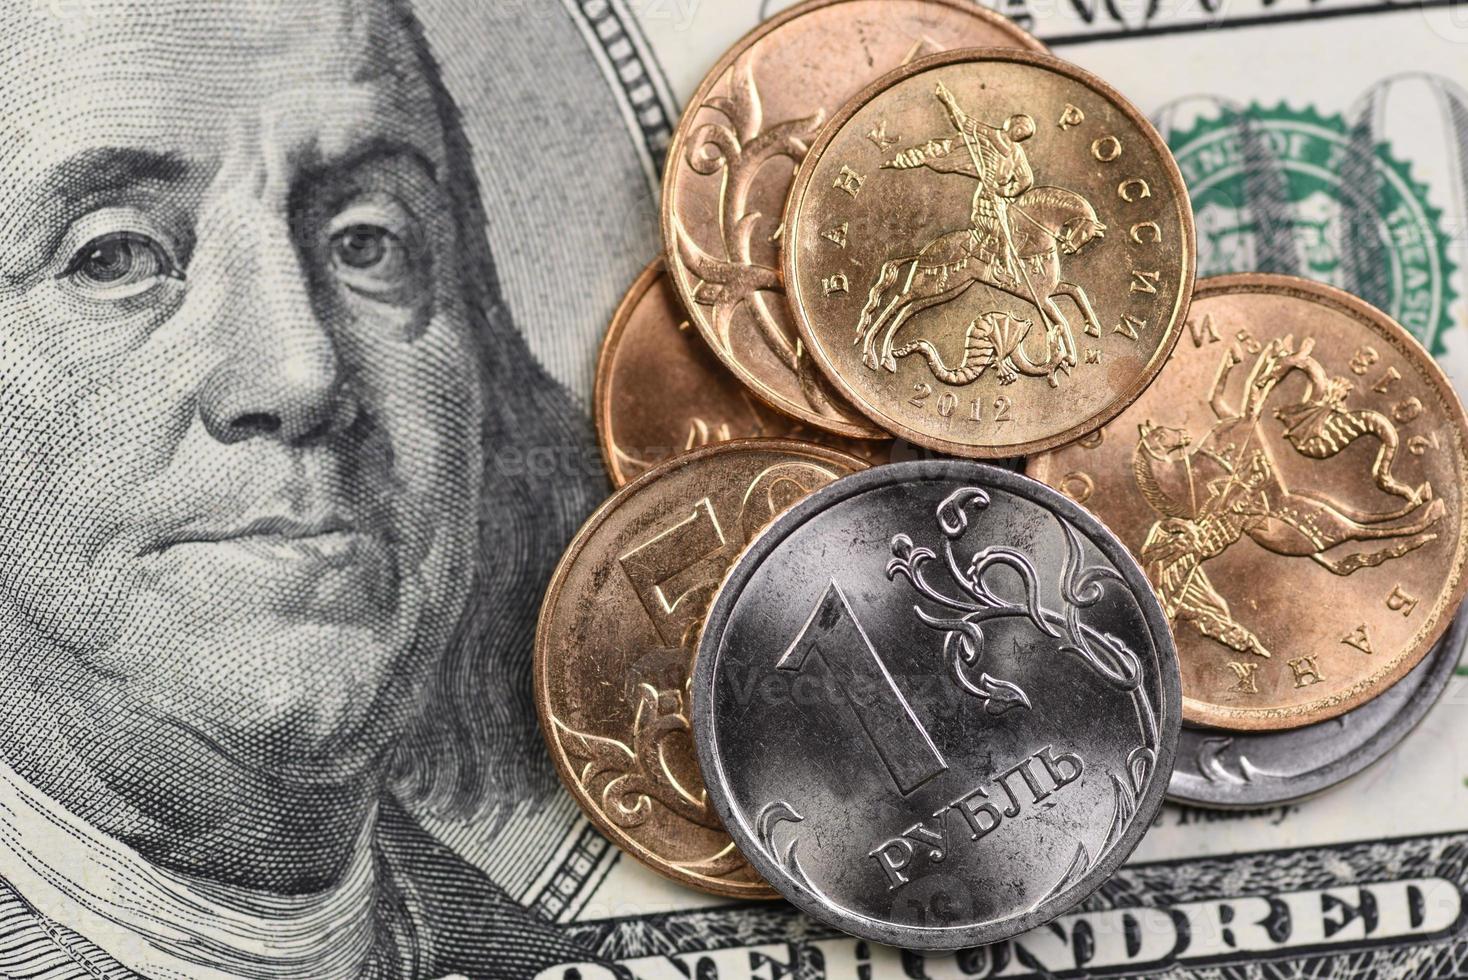 Russische munten en 100 dollar foto